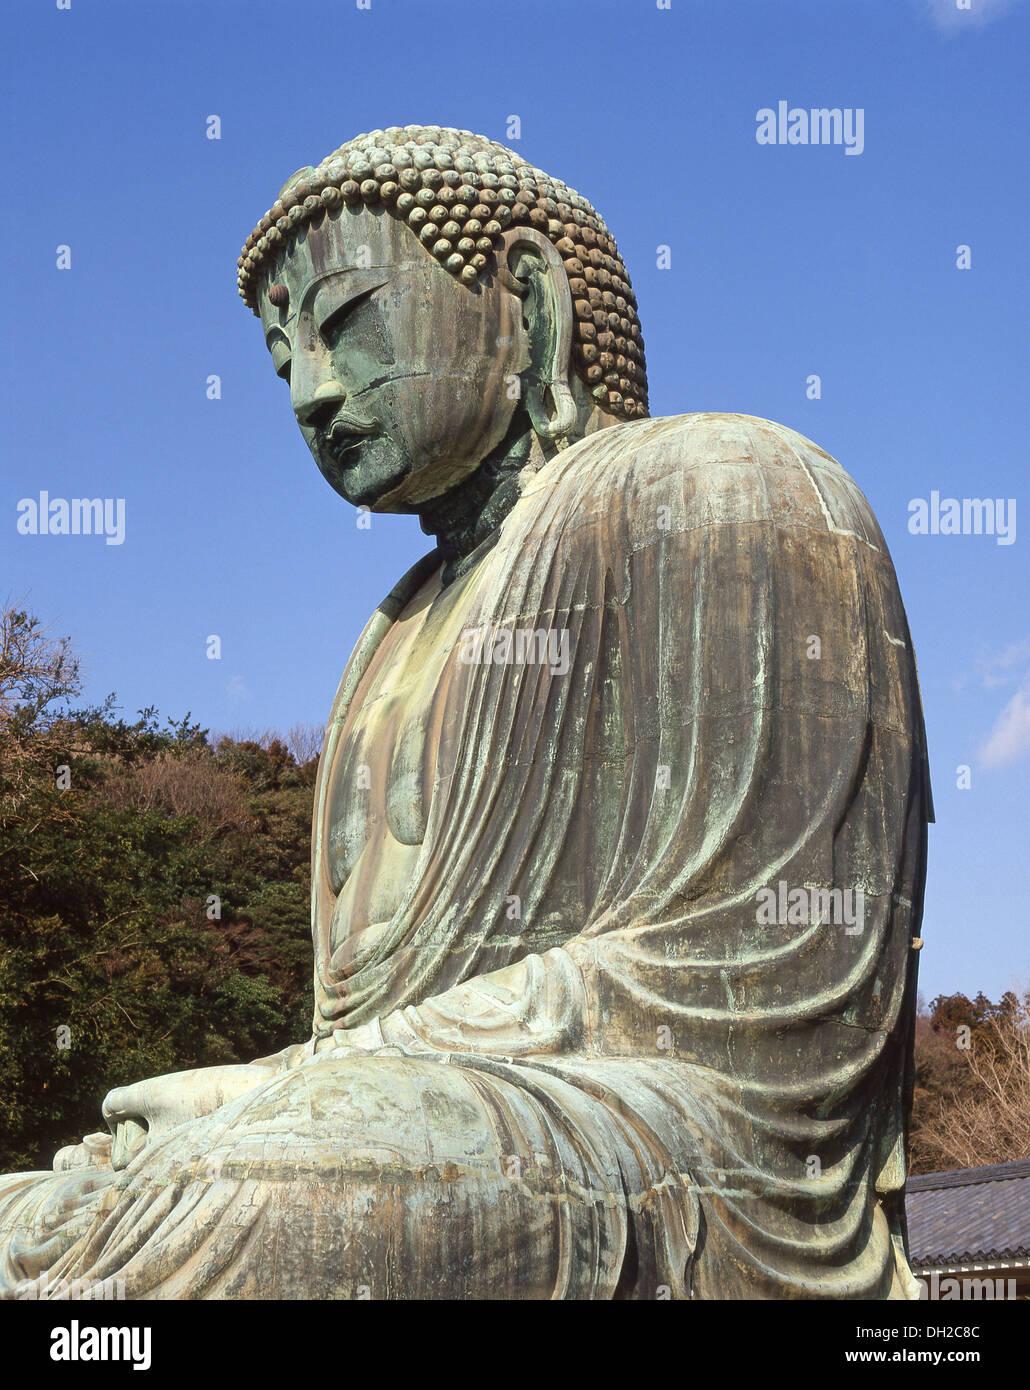 The Great Buddha of Kamakura, Kōtoku-in Temple, Kamakura, Kanagawa Prefecture, Honshu, Japan - Stock Image